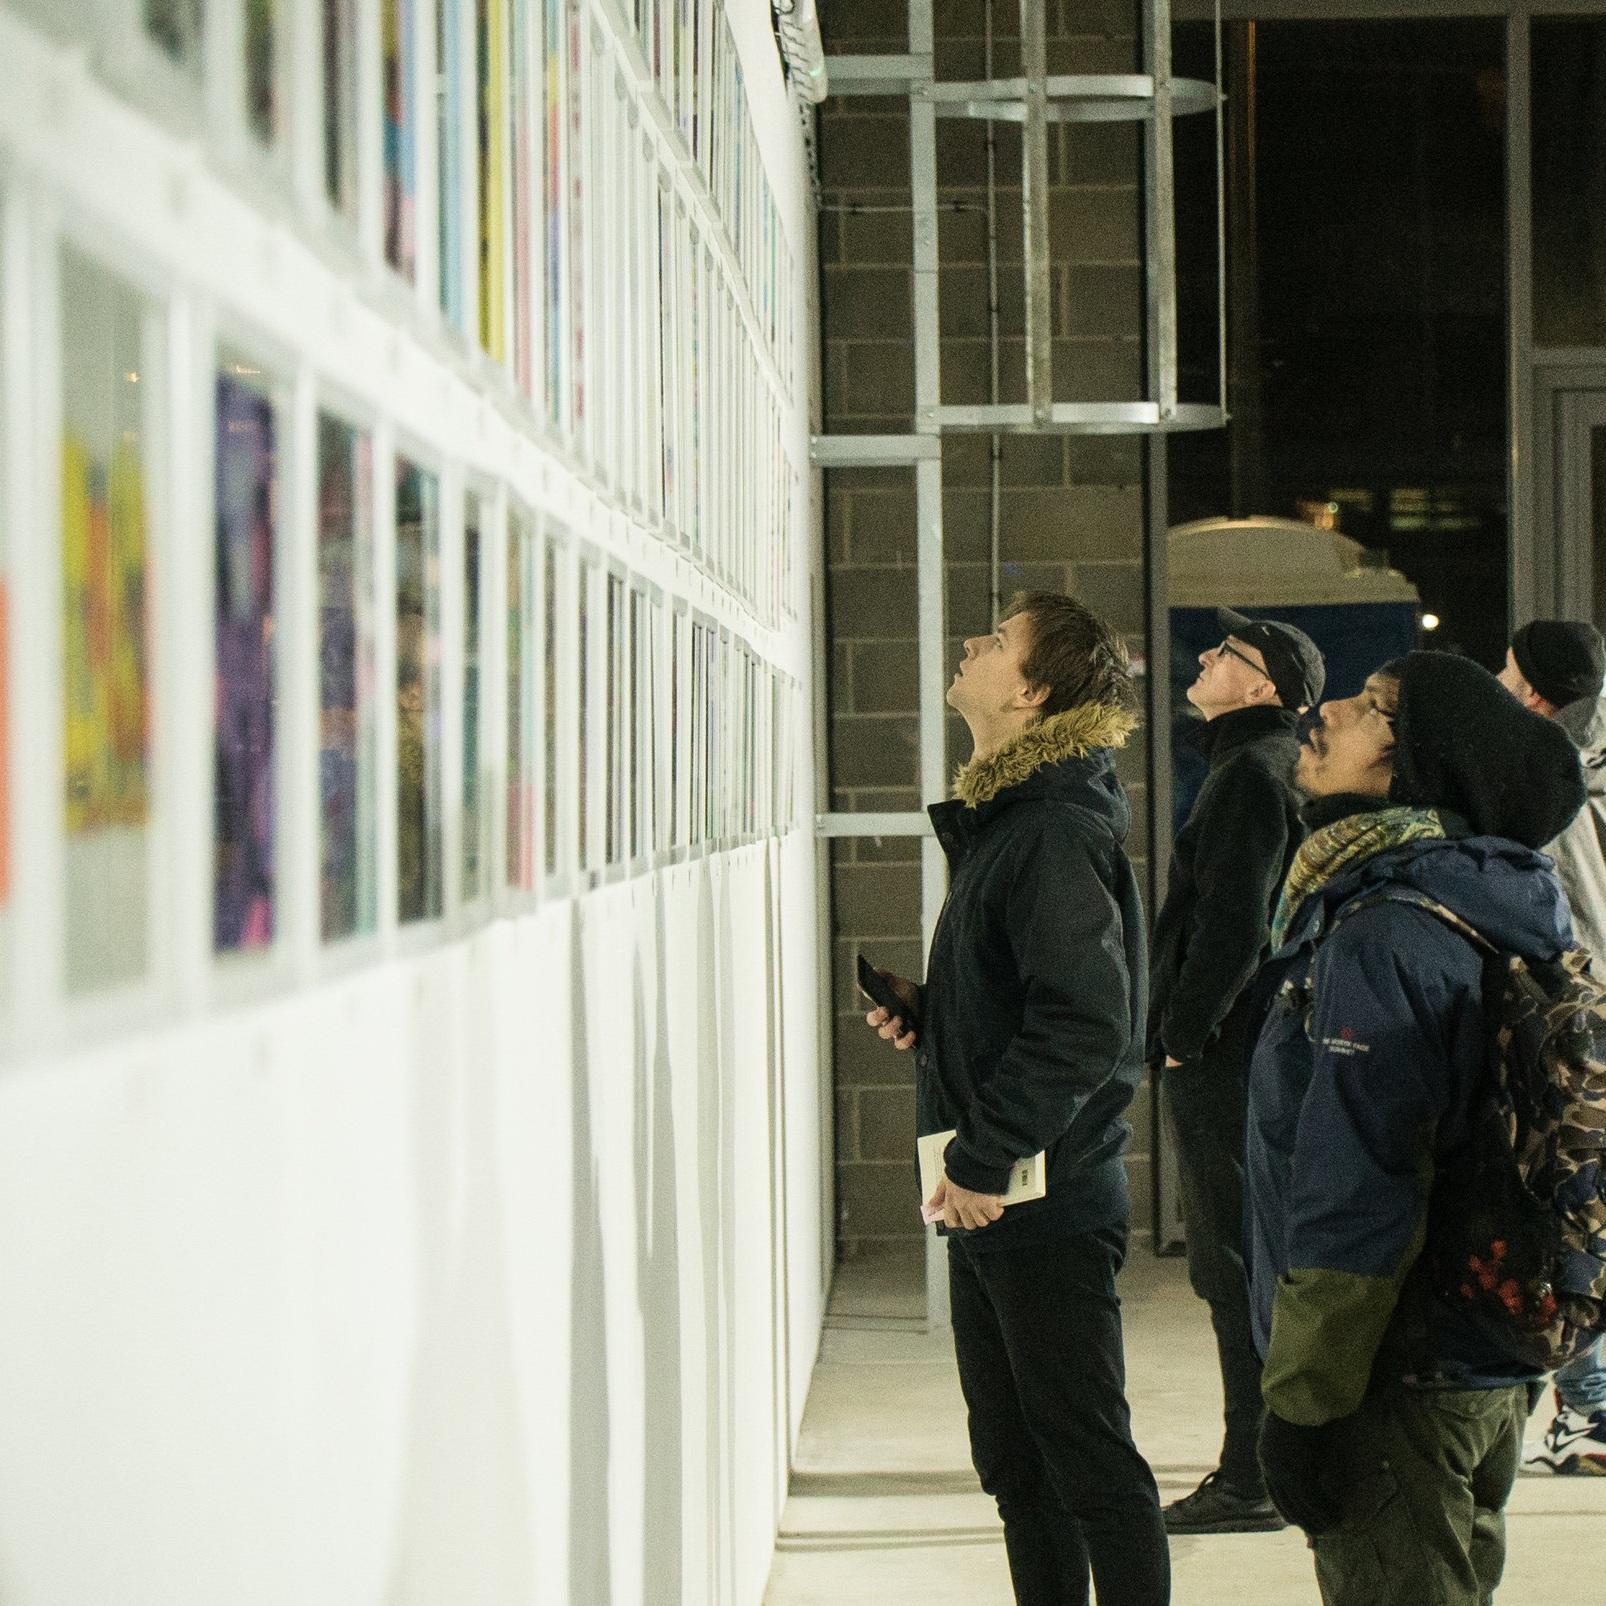 Pilot+Exhibition+%2813+of+35%29.jpg